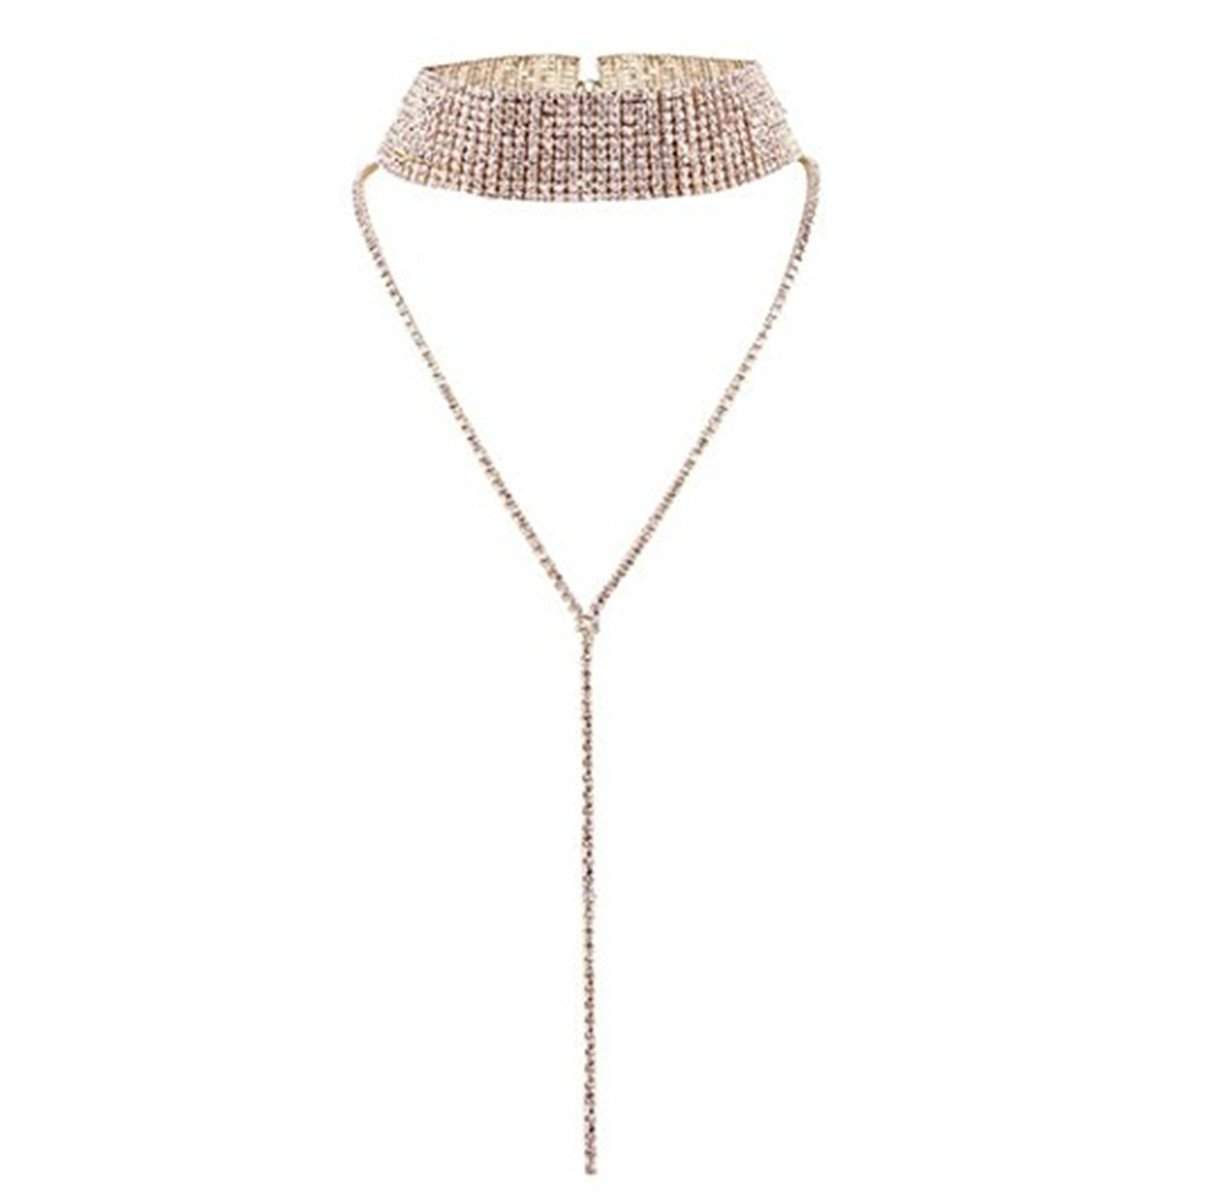 Yinew Voll Nachahmung Diamant Kristall Strass Multi Collier